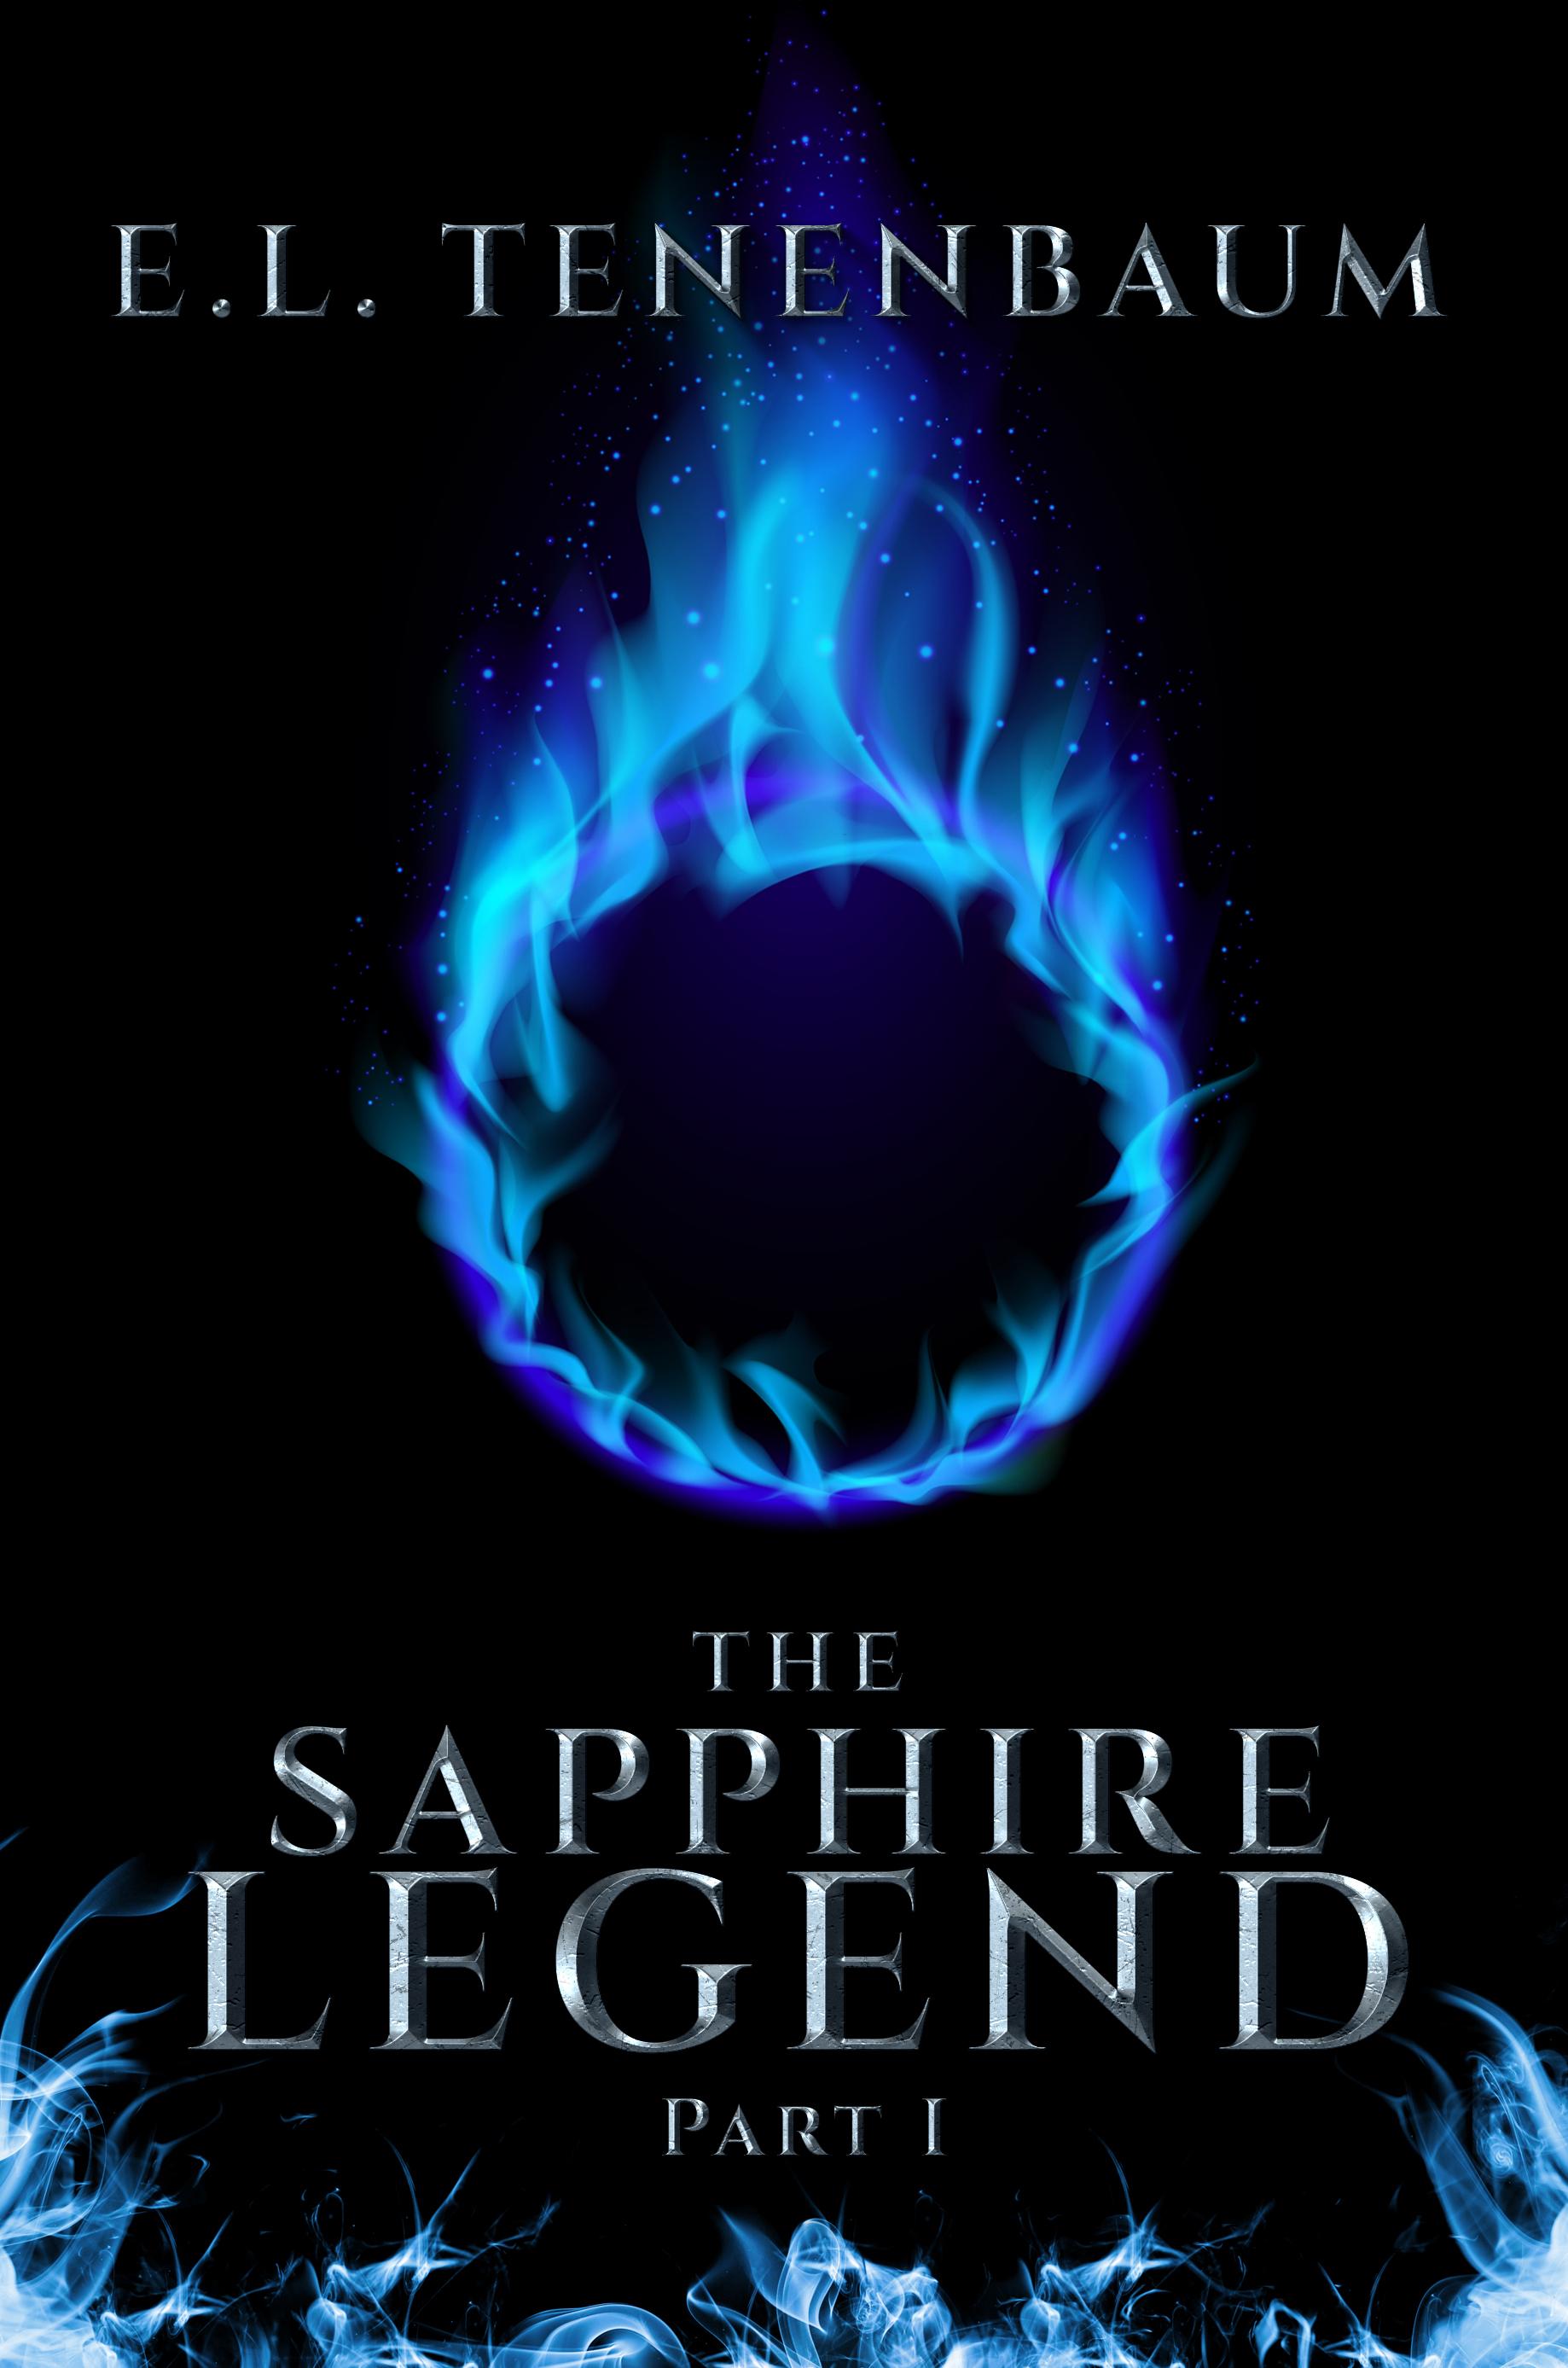 The Sapphire Legend, Part I E.L. Tenenbaum